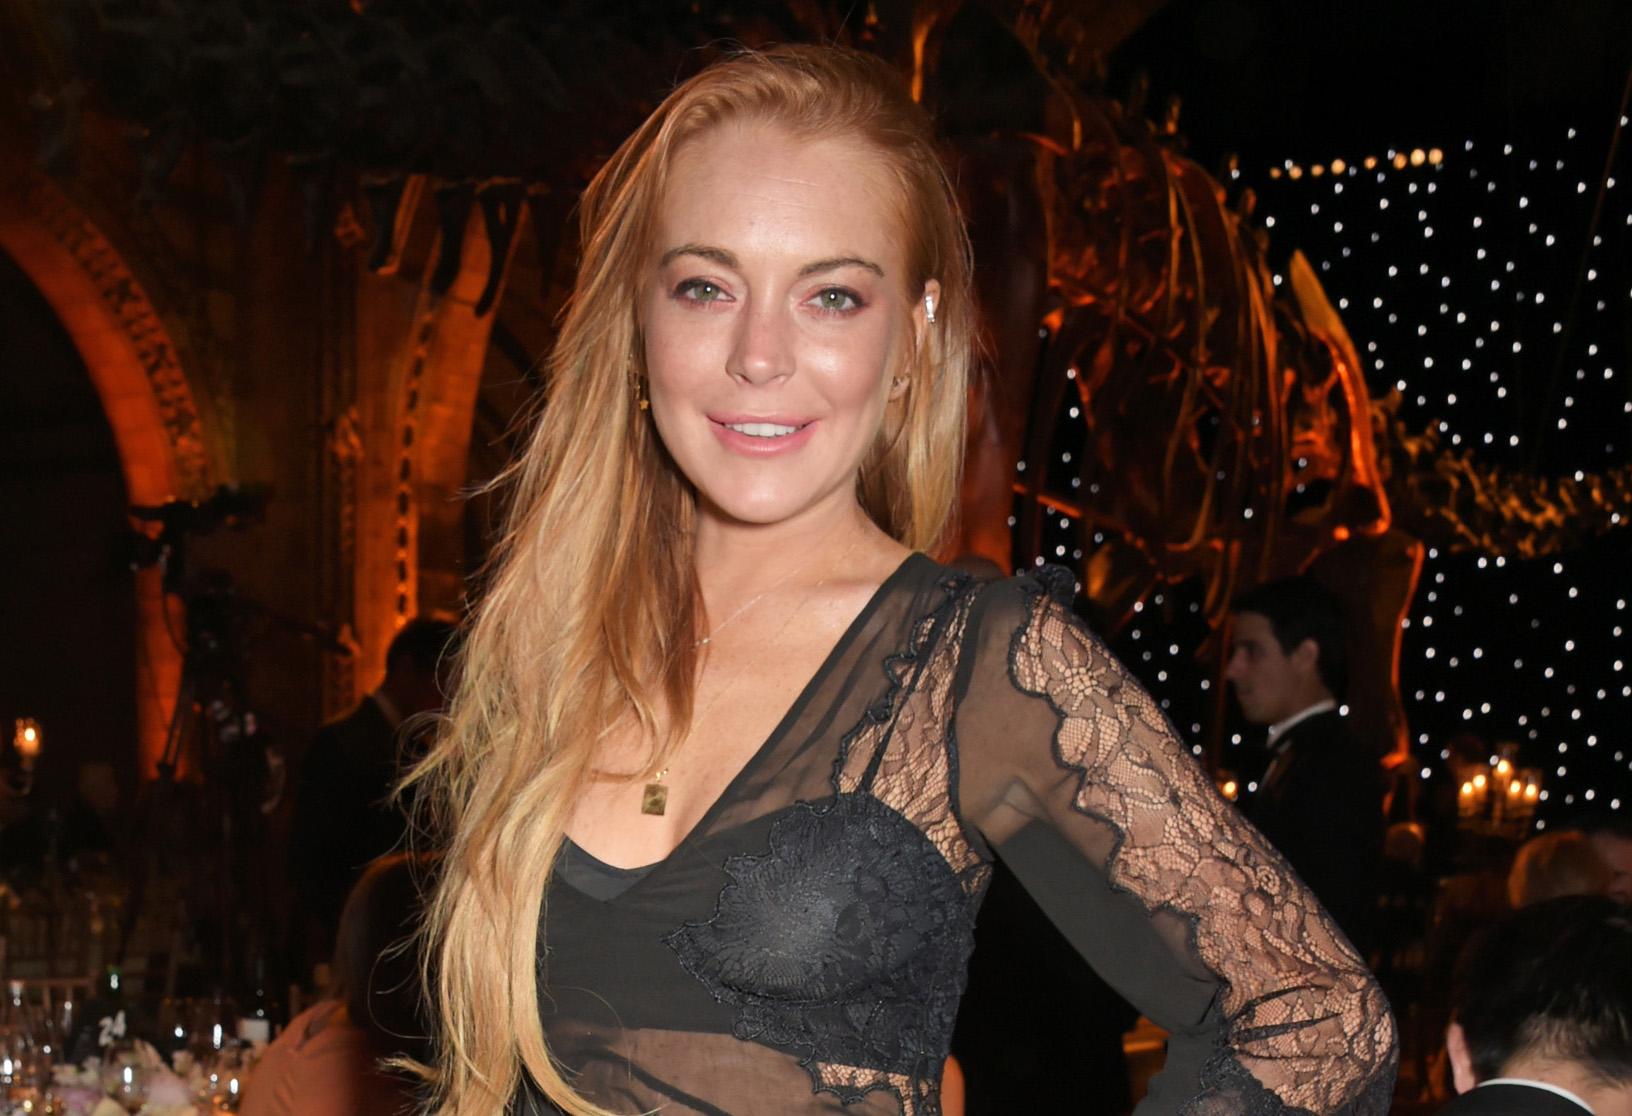 Does not Lindsay lohan flash